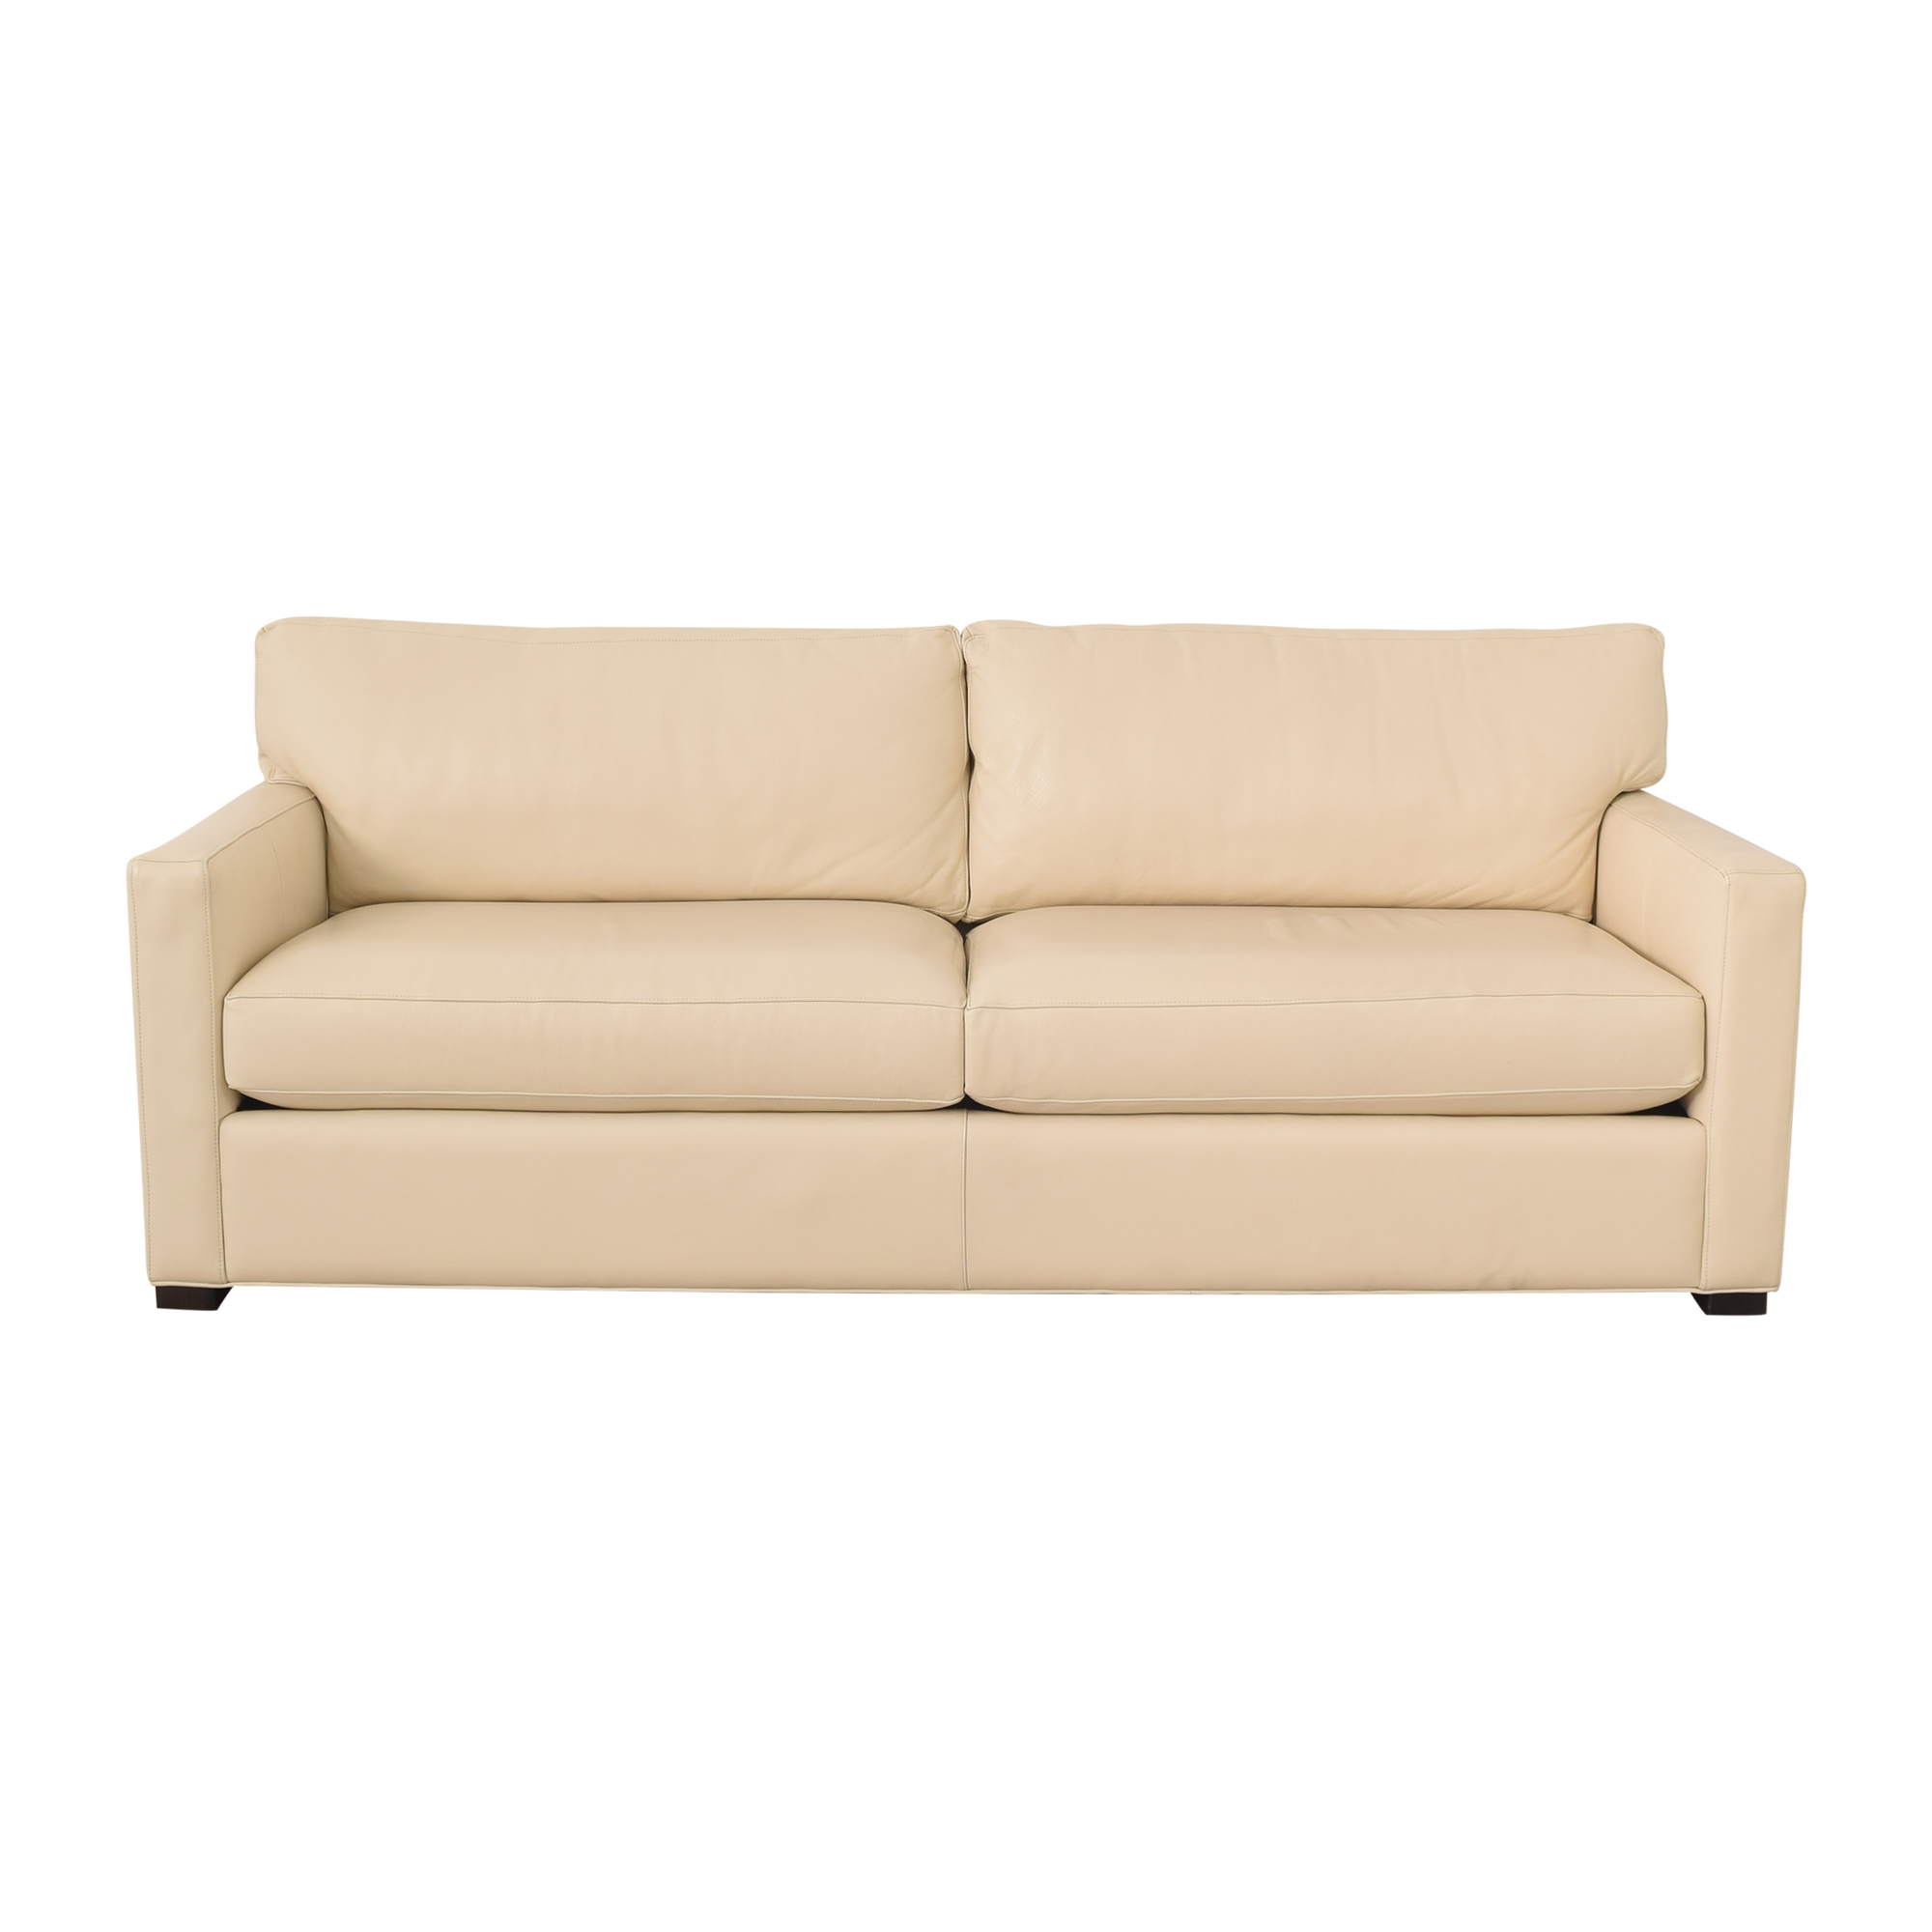 Room & Board Room & Board Two Cushion Sofa ivory